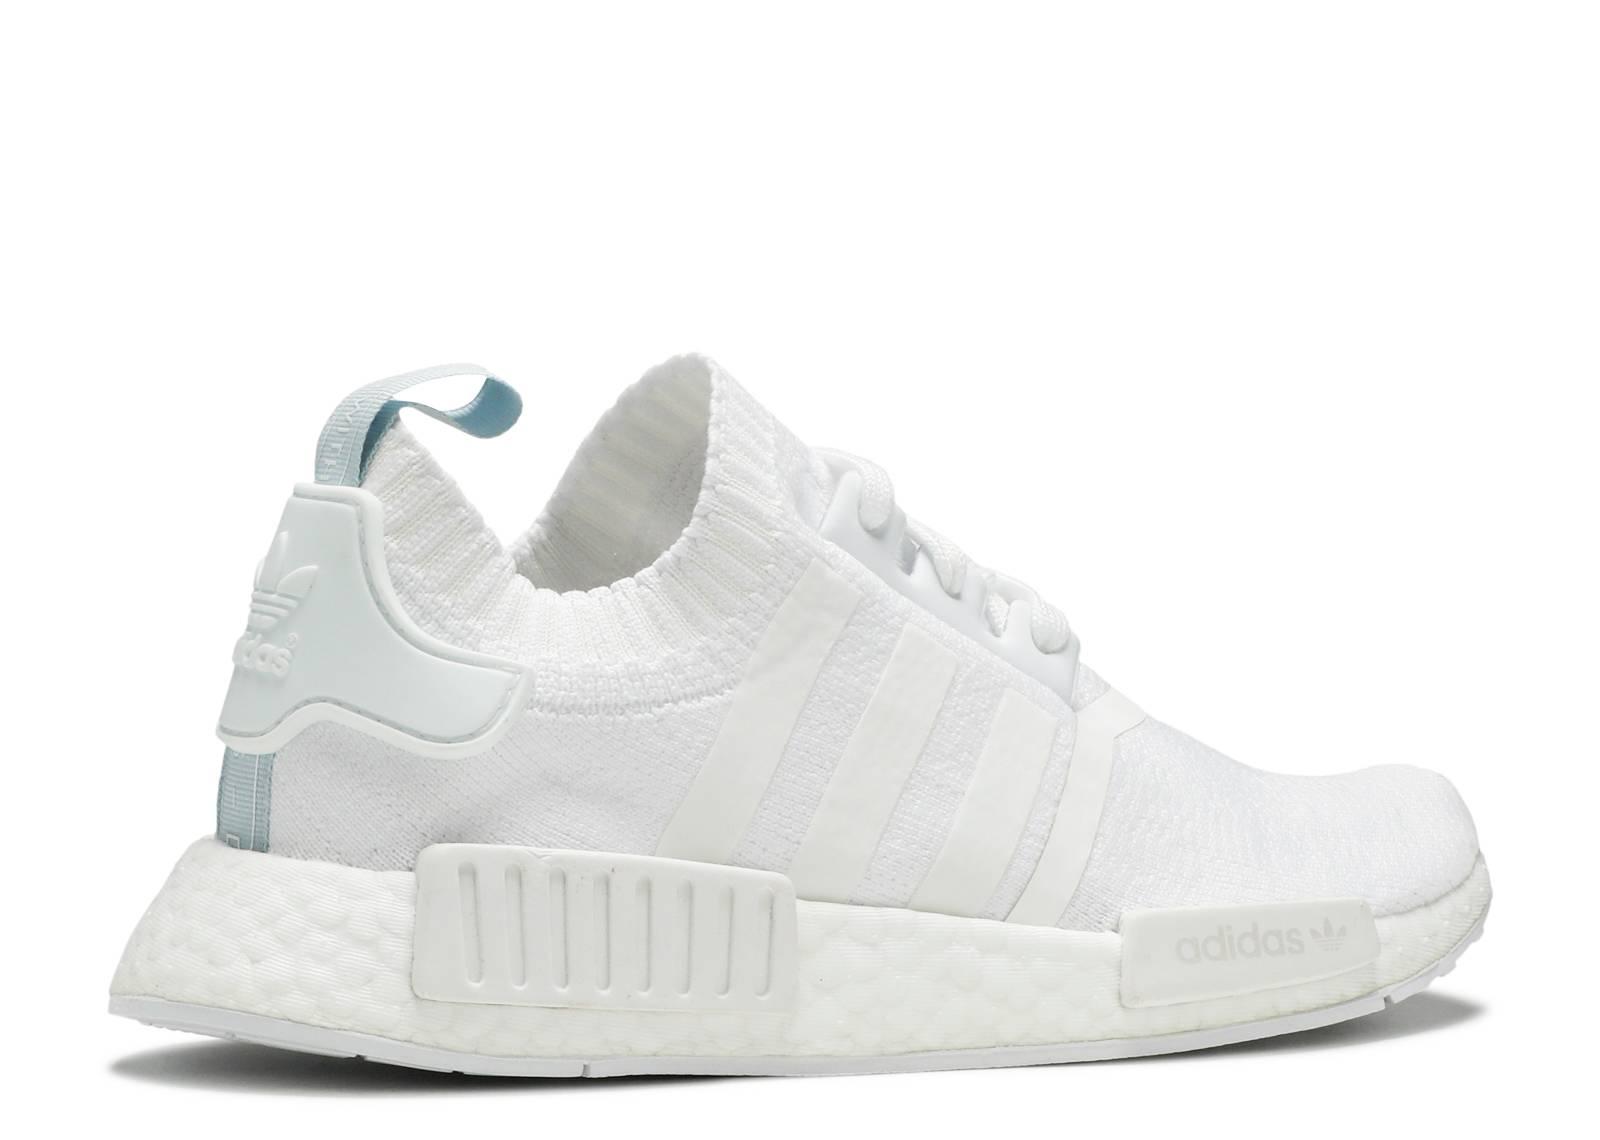 a34a0c885660f Nmd R1 Pk W - Adidas - cq2040 - running white running white blue tint